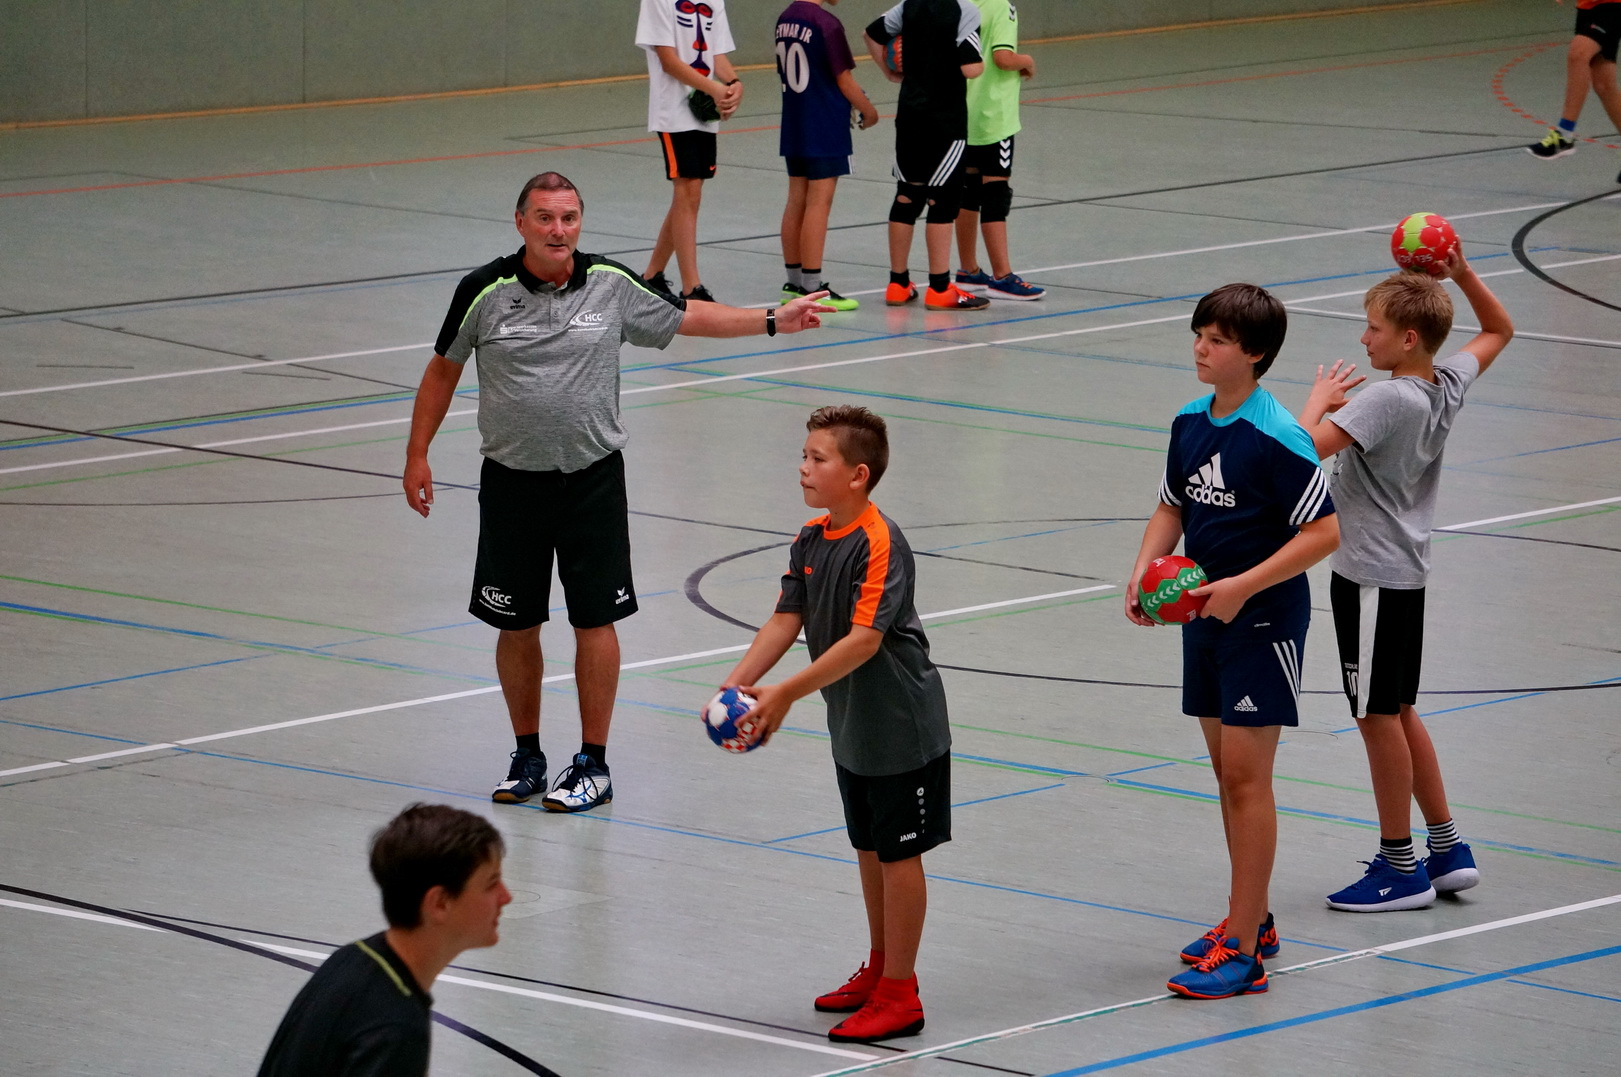 201808_Handballcamp_SDH_MG_094w